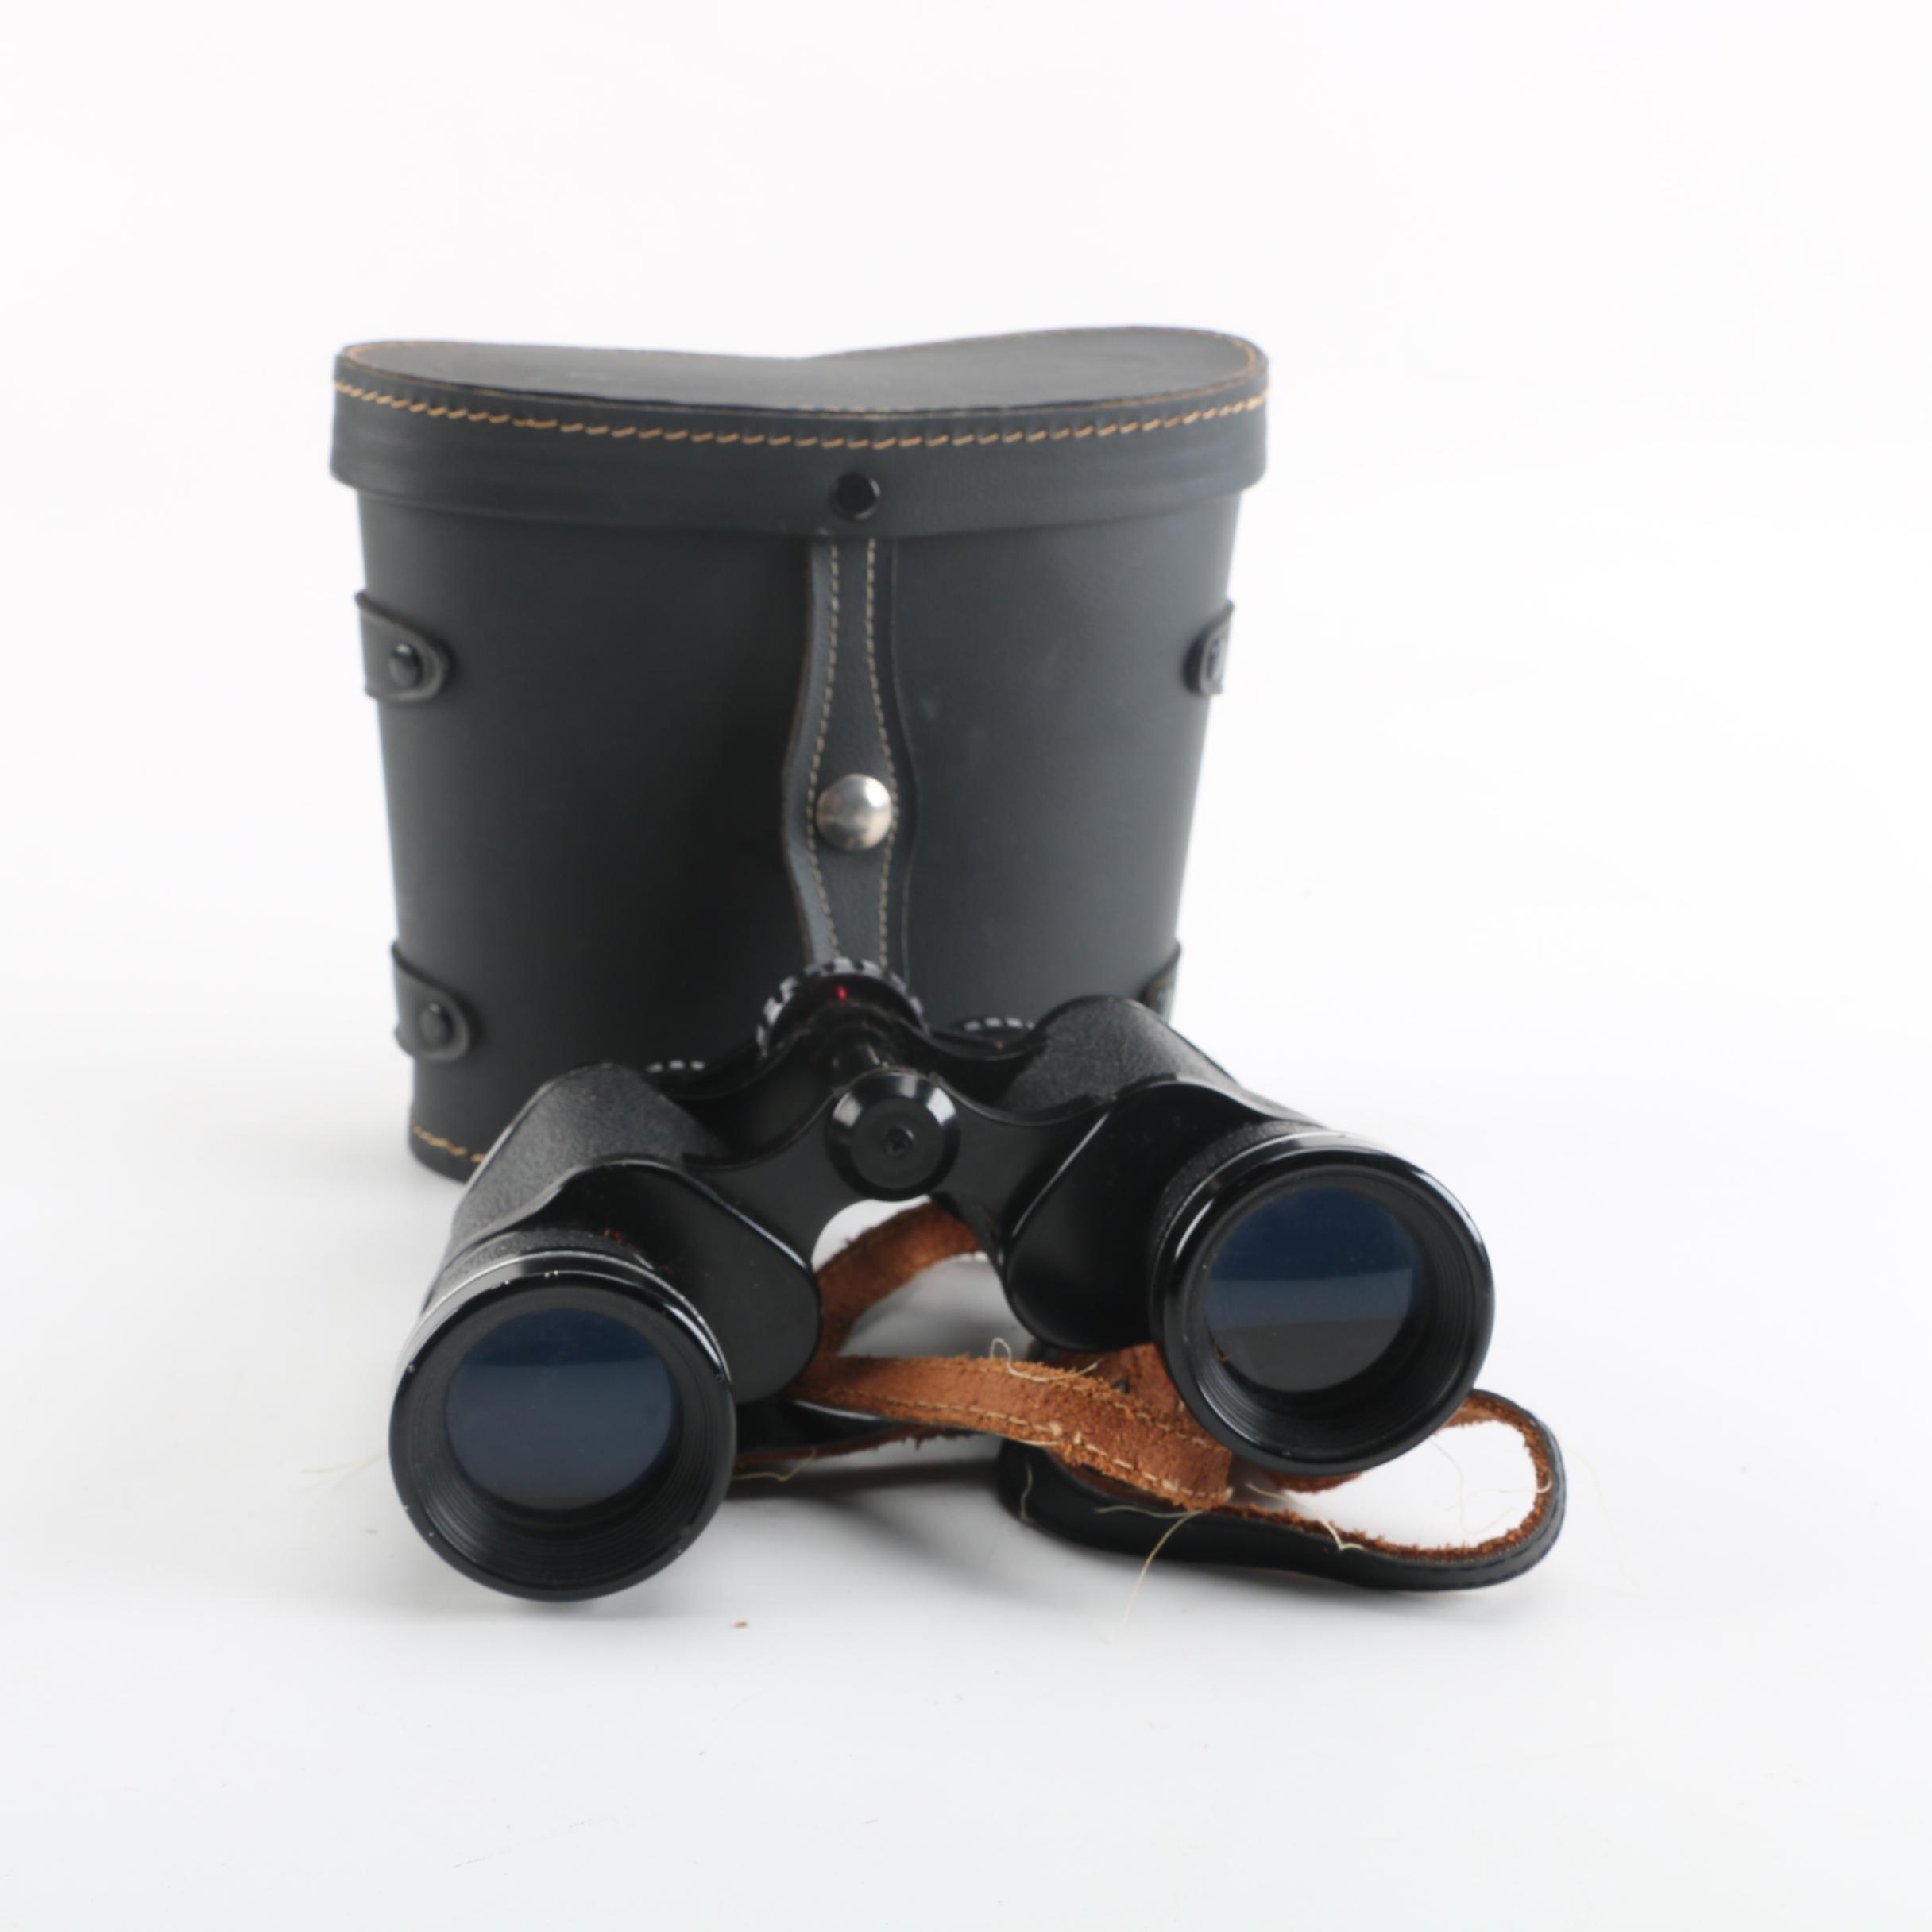 Vintage Lentar 7 x 35 Binoculars with Case